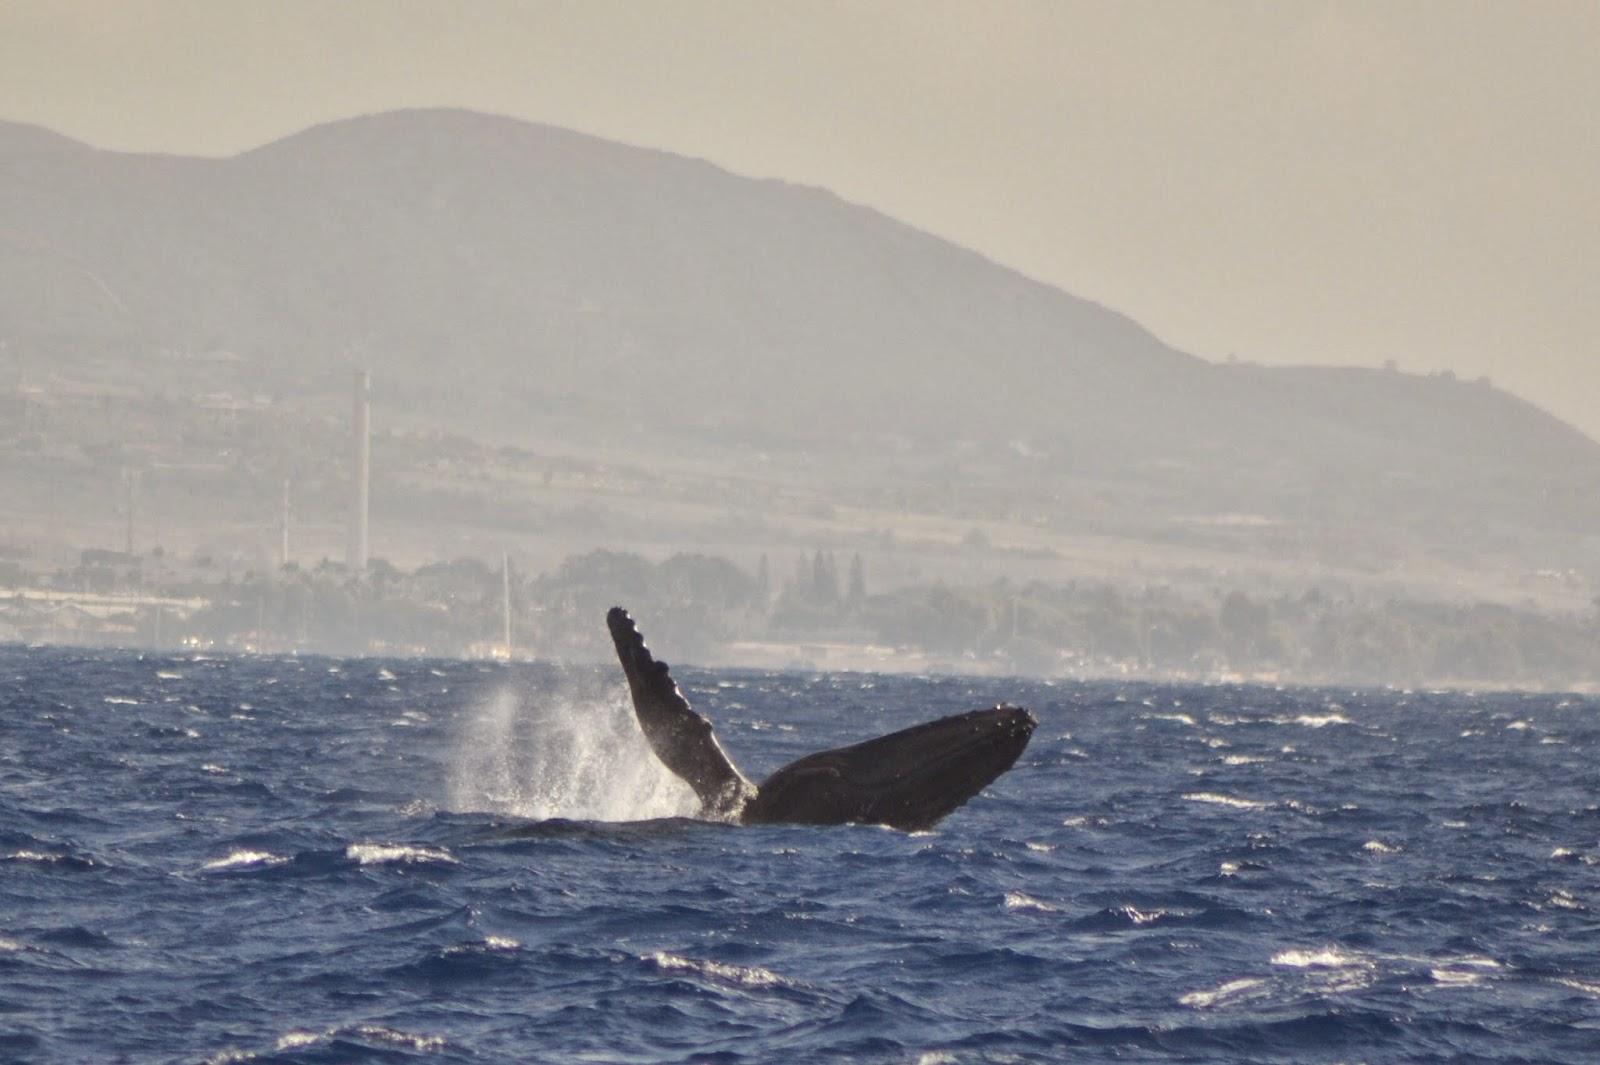 Whale Watching Maui | Humpback Whales